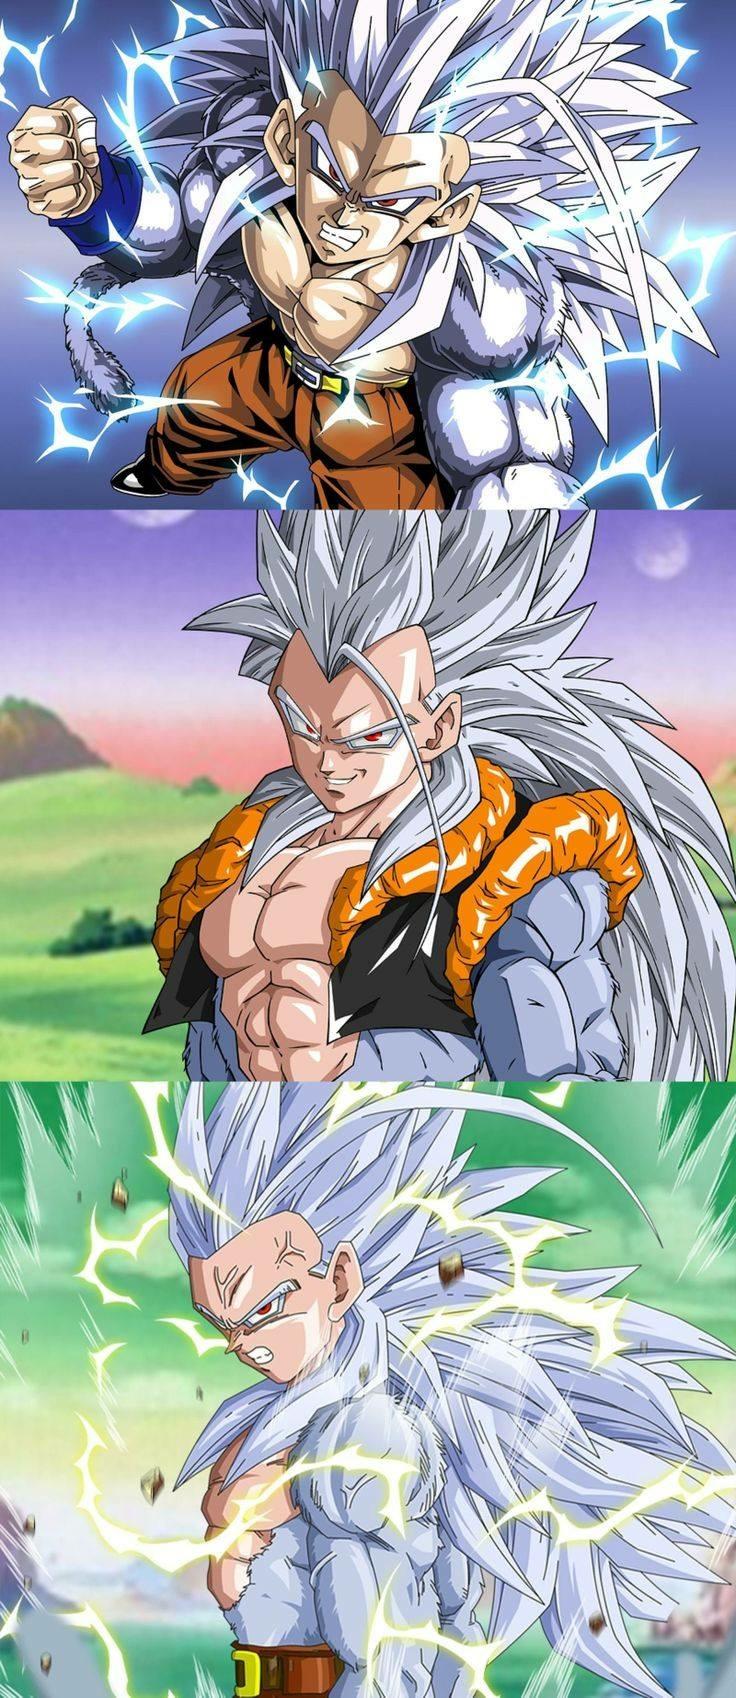 Dragon-Ball-AF-fan-art-Goku-wallpaper-wp3405030